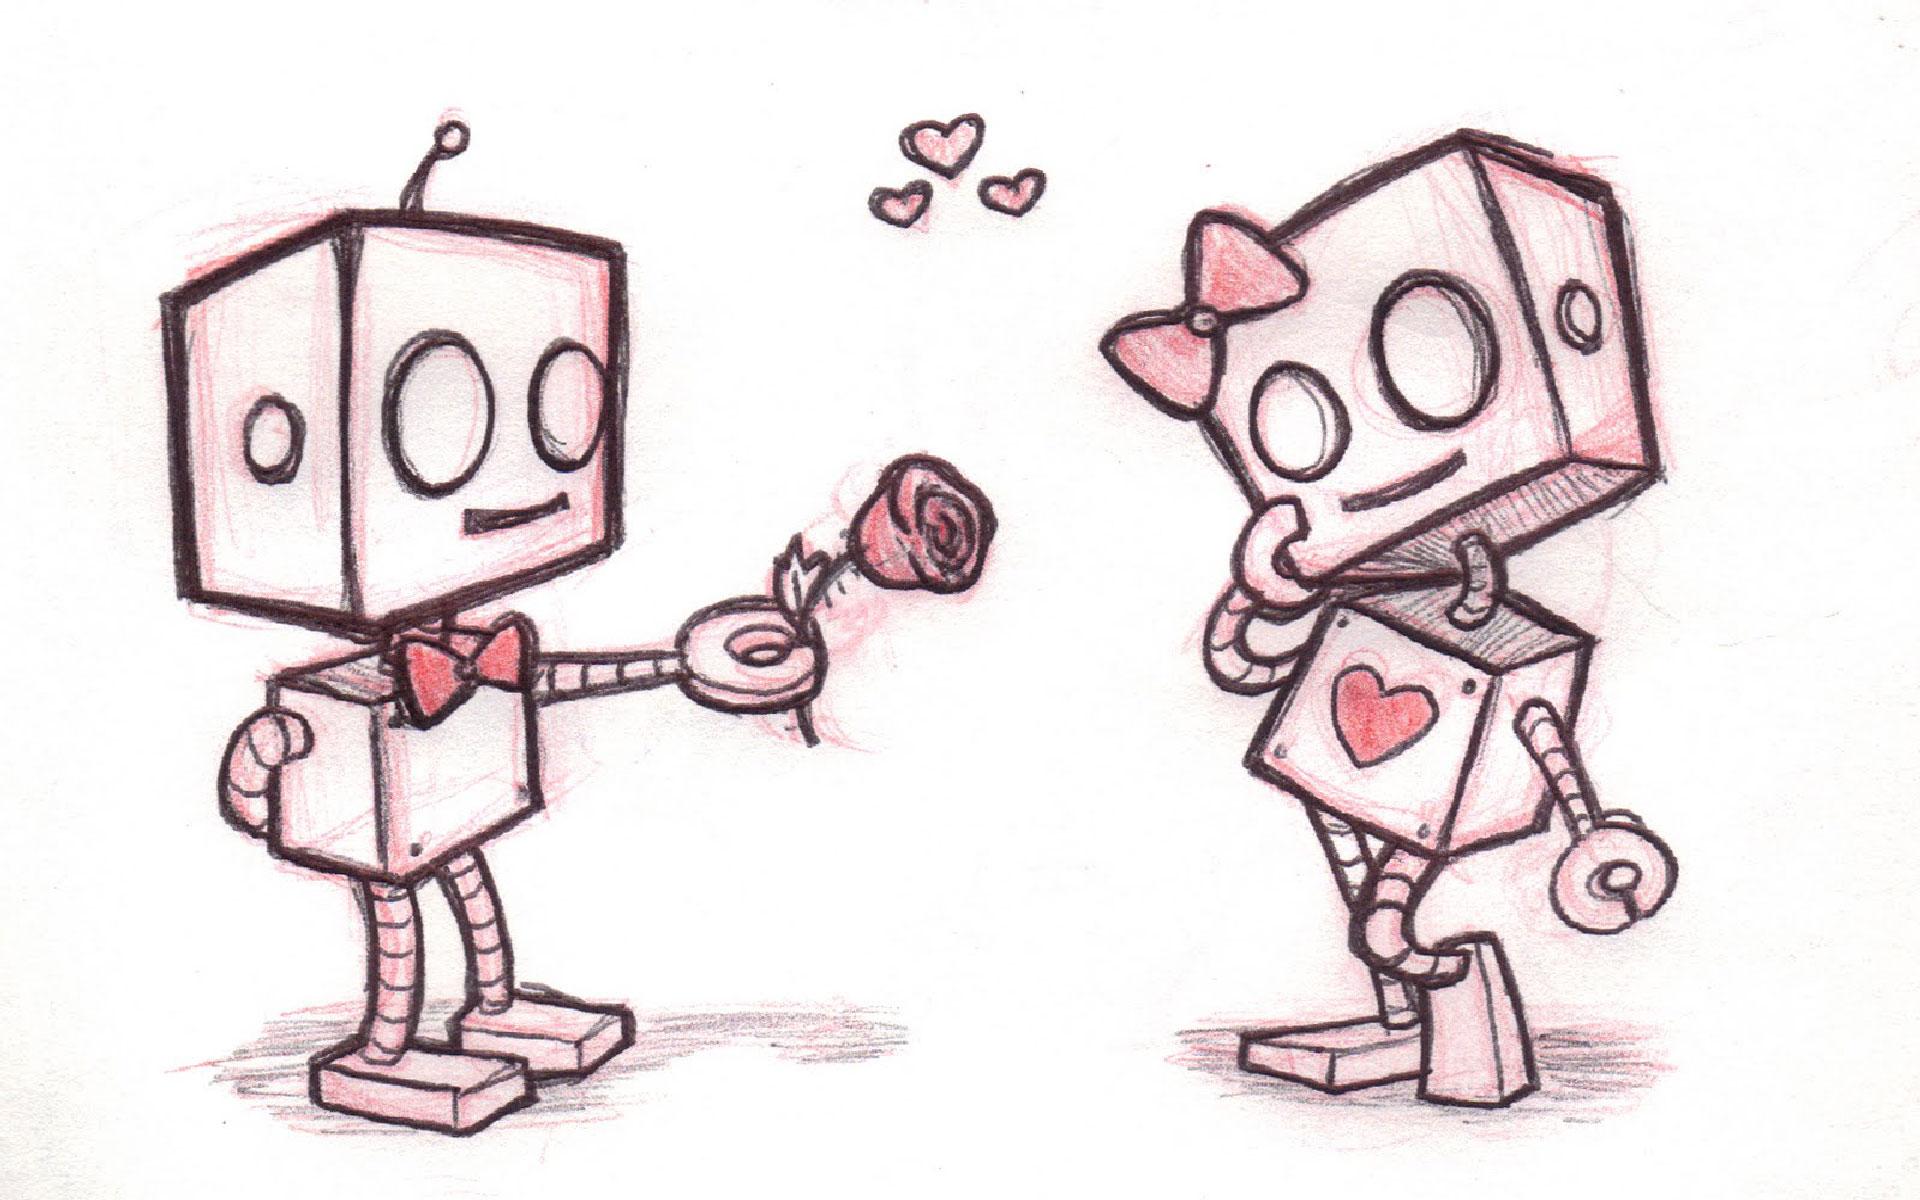 1920x1200 Love Art Pencil Boyfriend Girlfriend Love Art Pencil Boyfriend